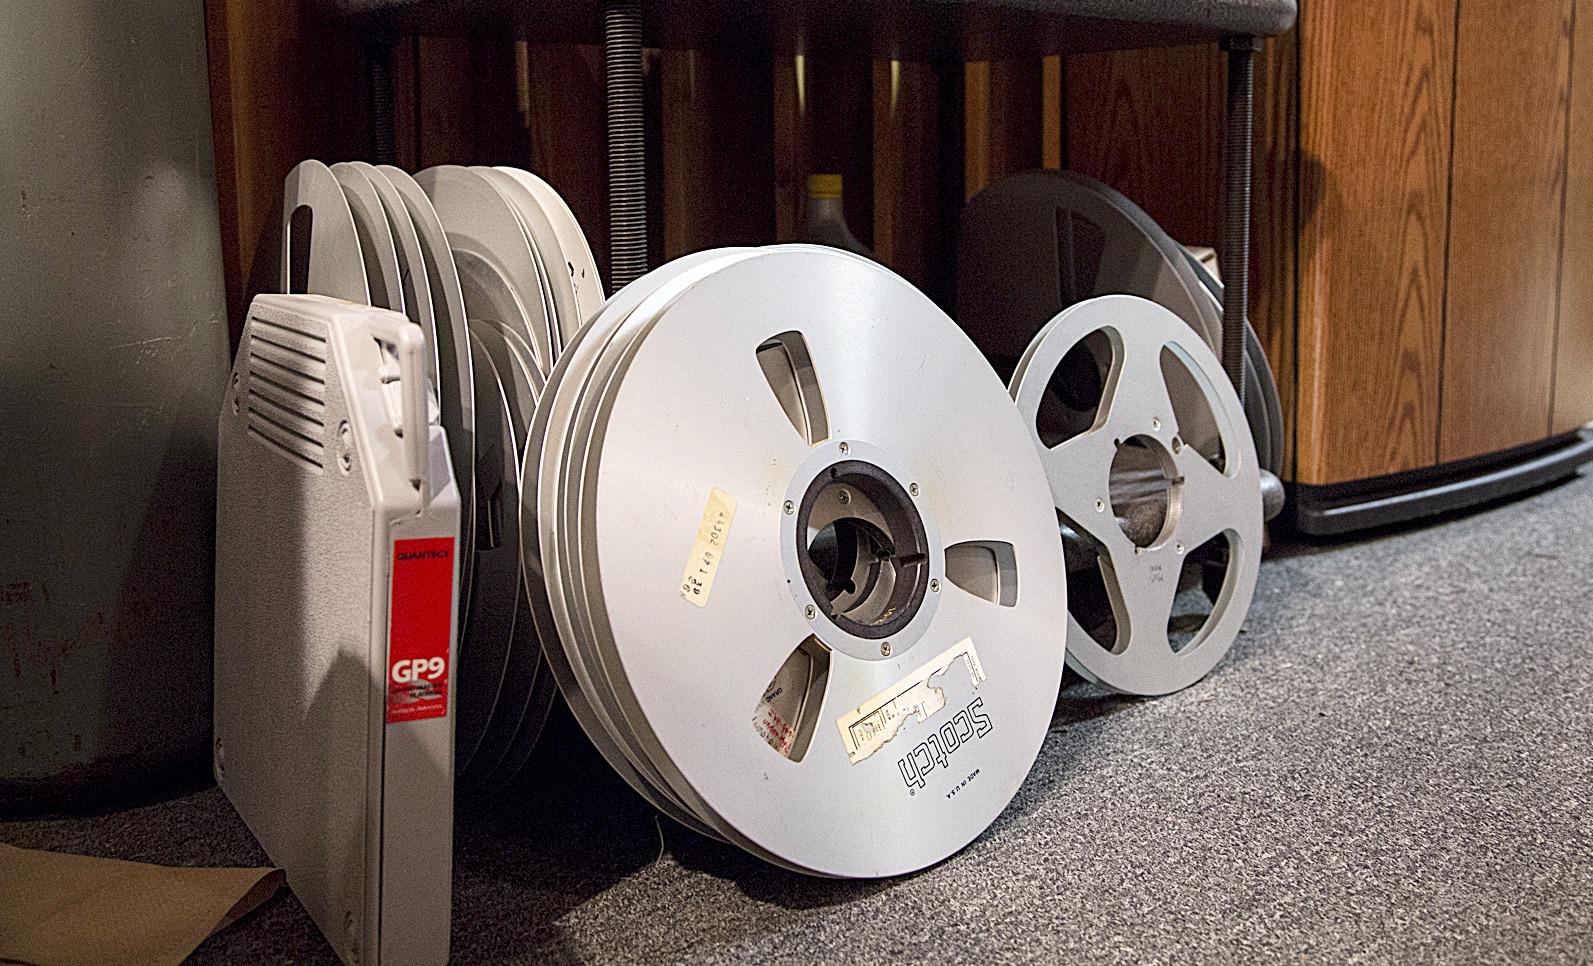 MoFi: audiophile grade vinyl records - Son-Vidéo.com: blog